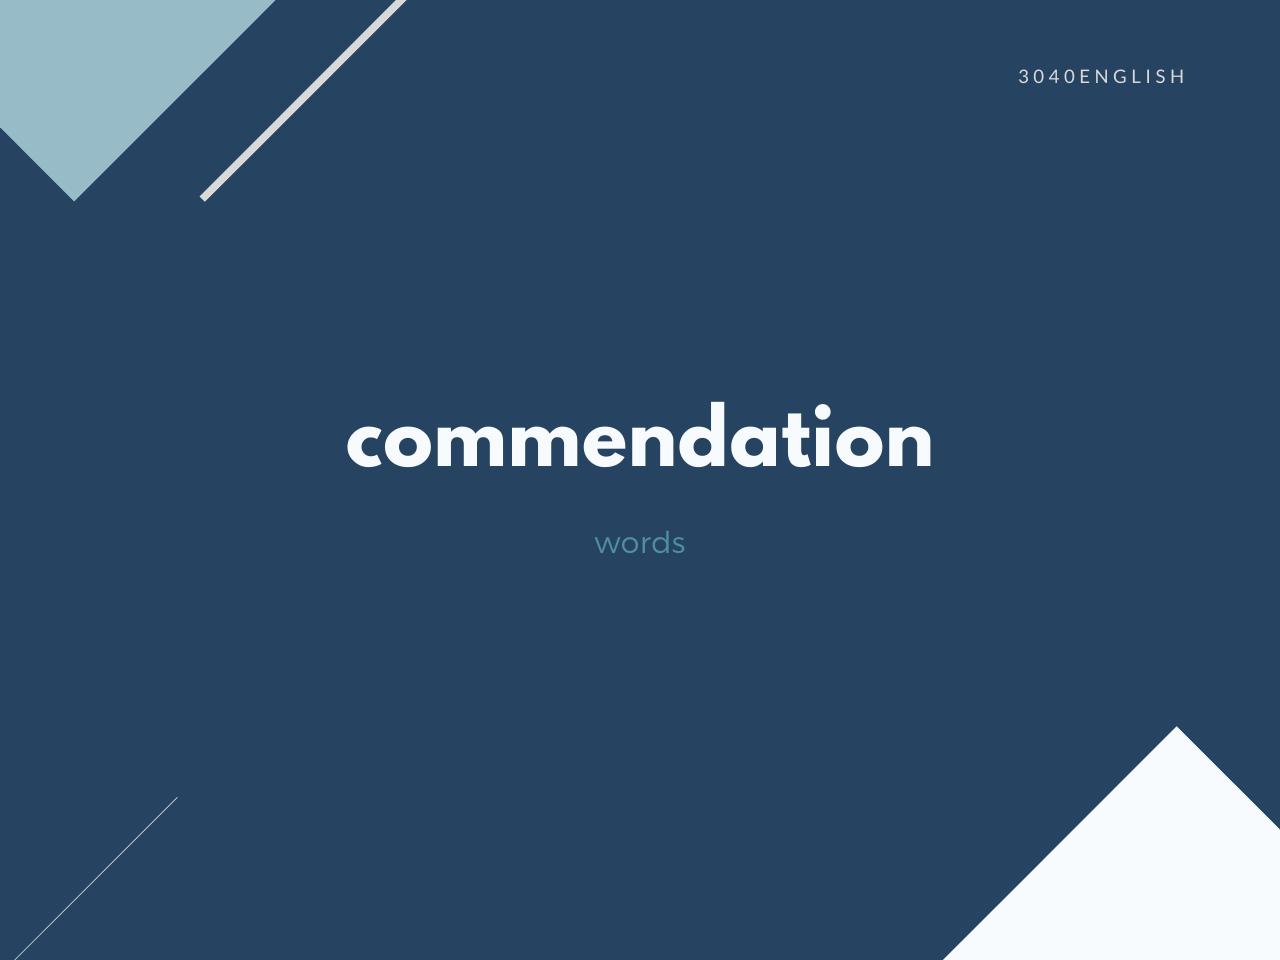 commendation の意味と簡単な使い方【音読用例文あり】